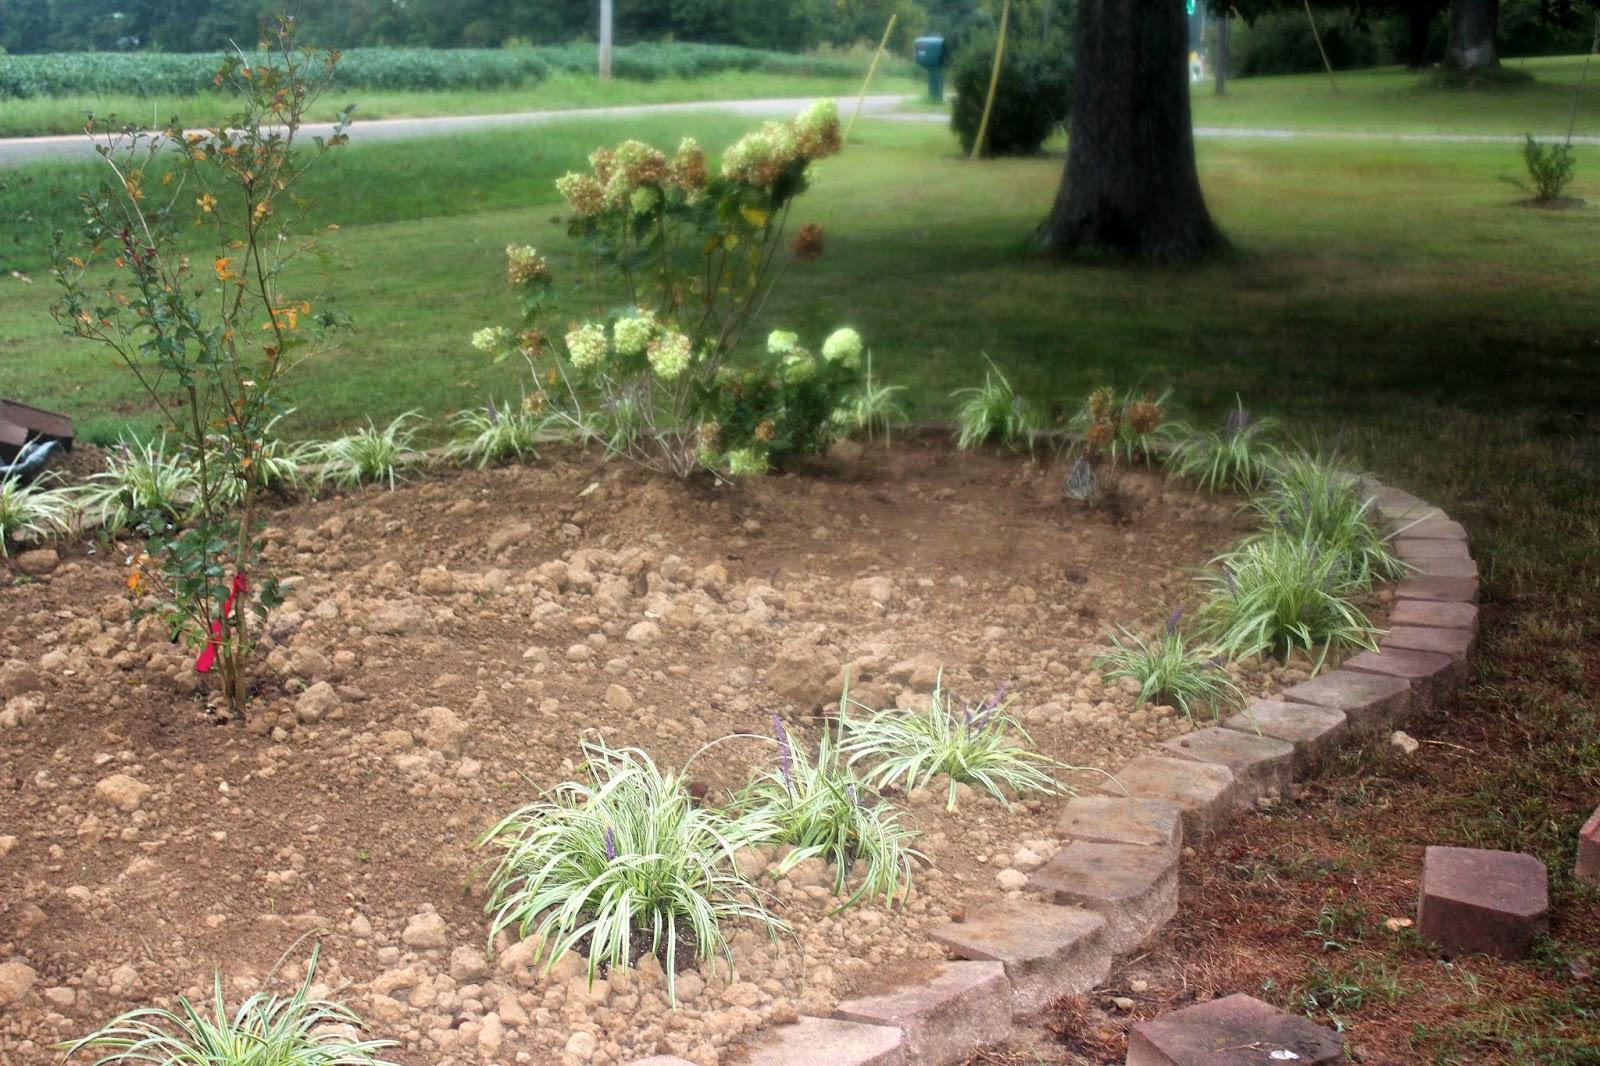 JBigg: Life in Kentucky: Flower Bed Project Update